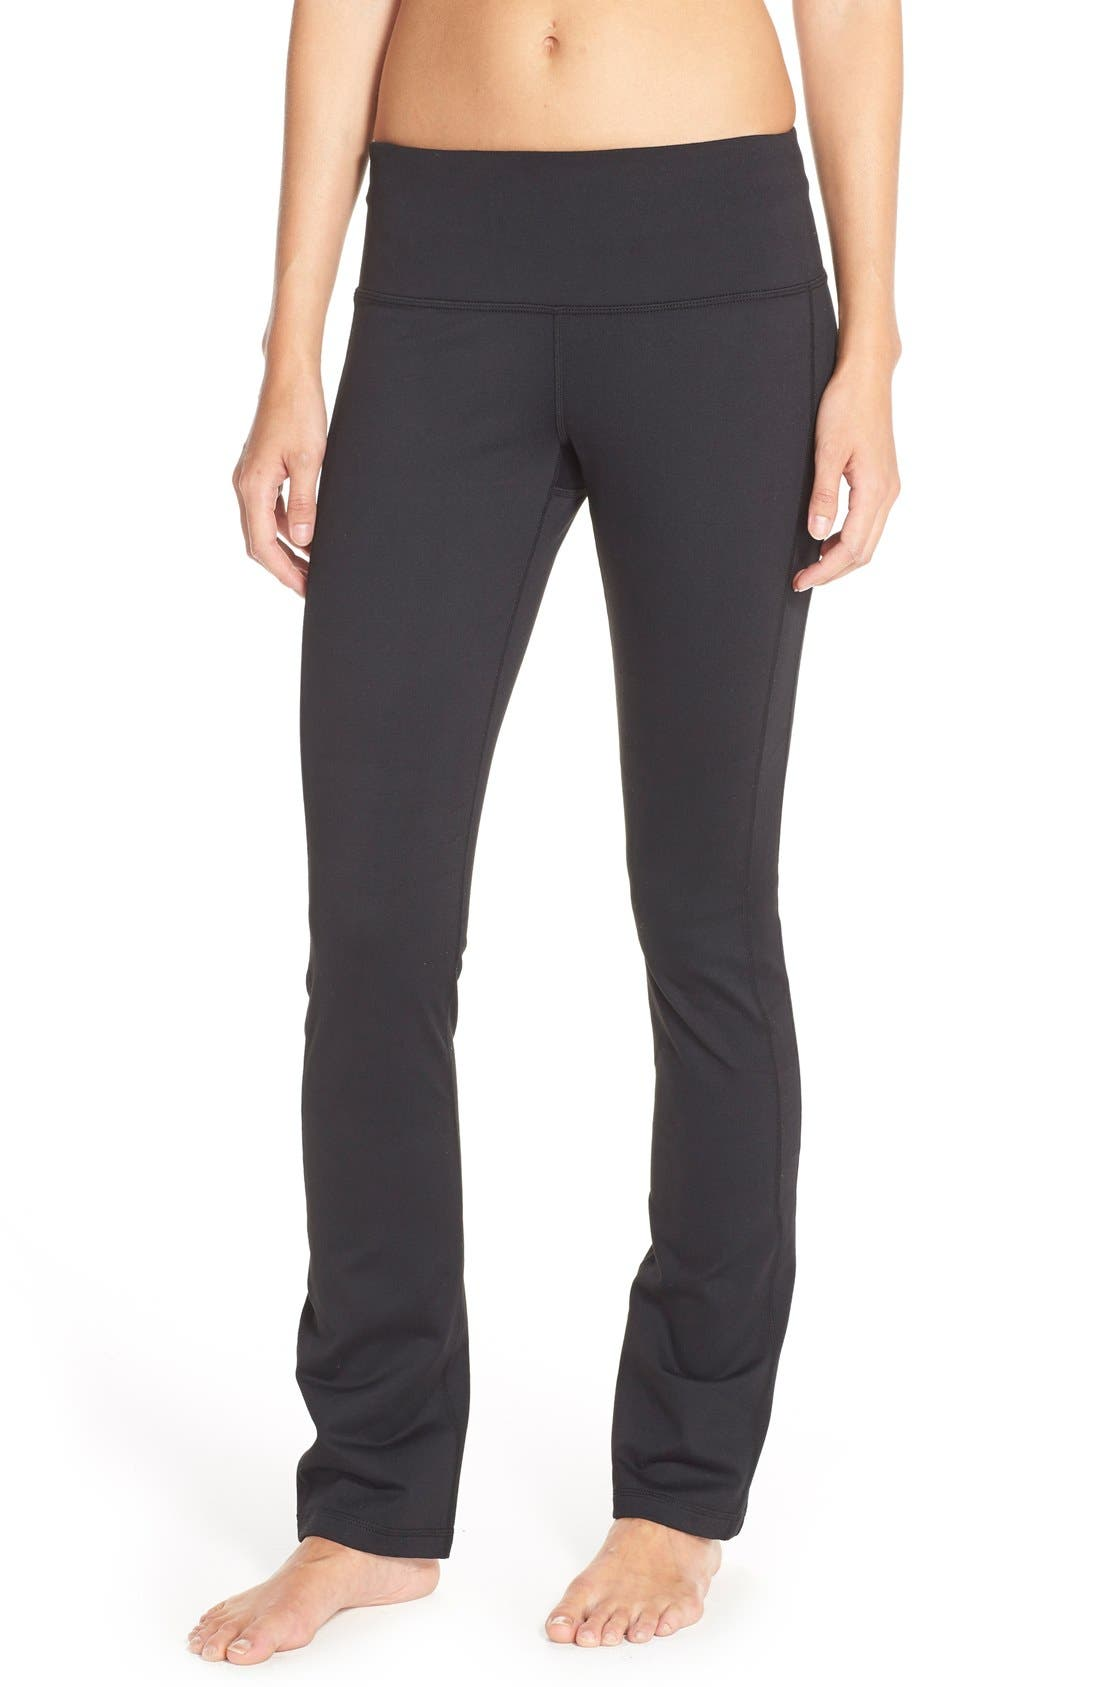 Alternate Image 1 Selected - Zella 'Plank' Pants